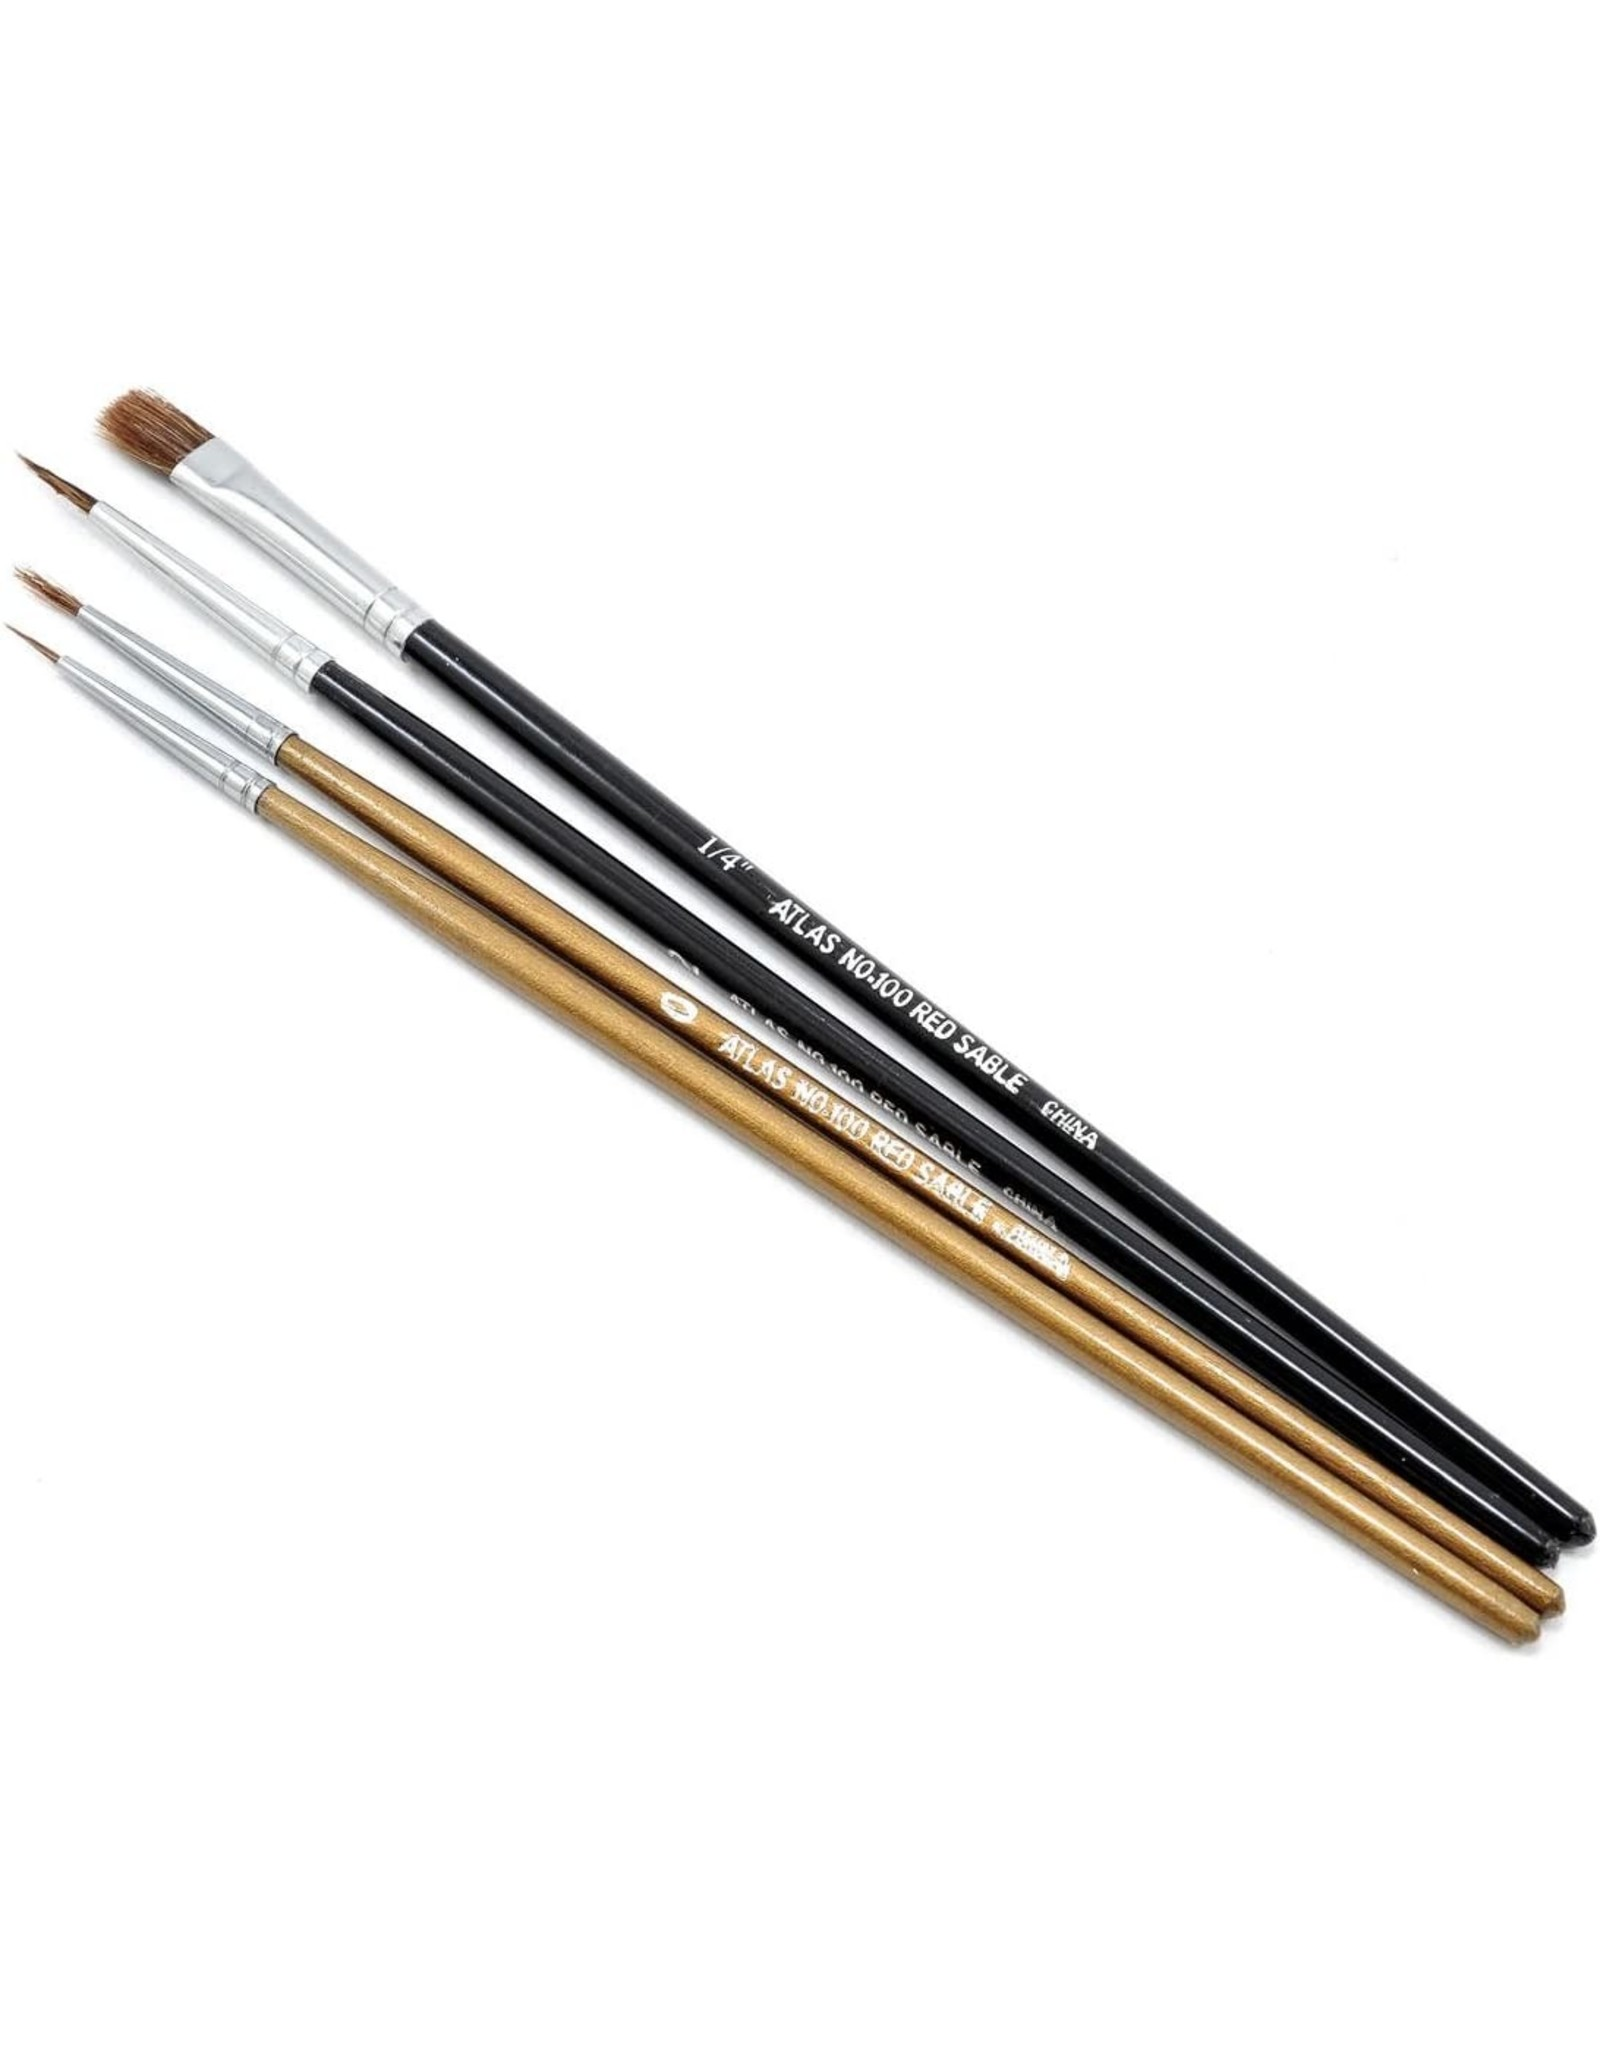 Atlas Brush Co. 1004PS - Camel/Sable 4 Piece Round/Flat Brush Set